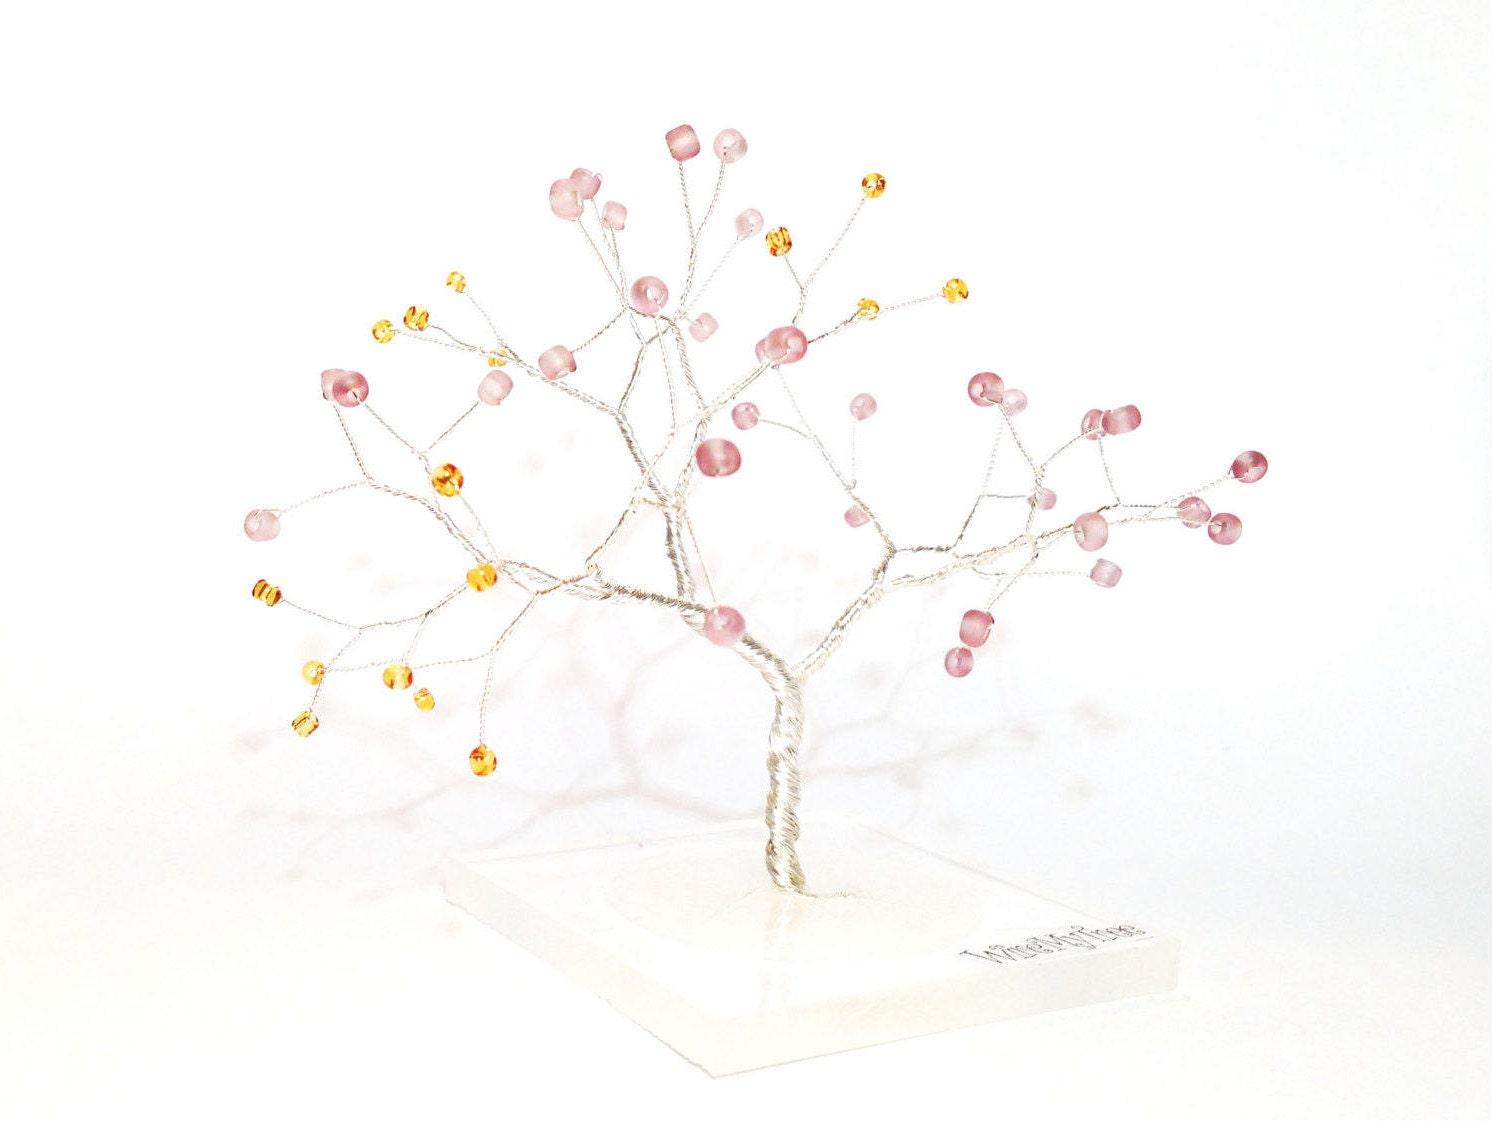 Silber Miniatur Draht Baum des Lebens orange lila Draht